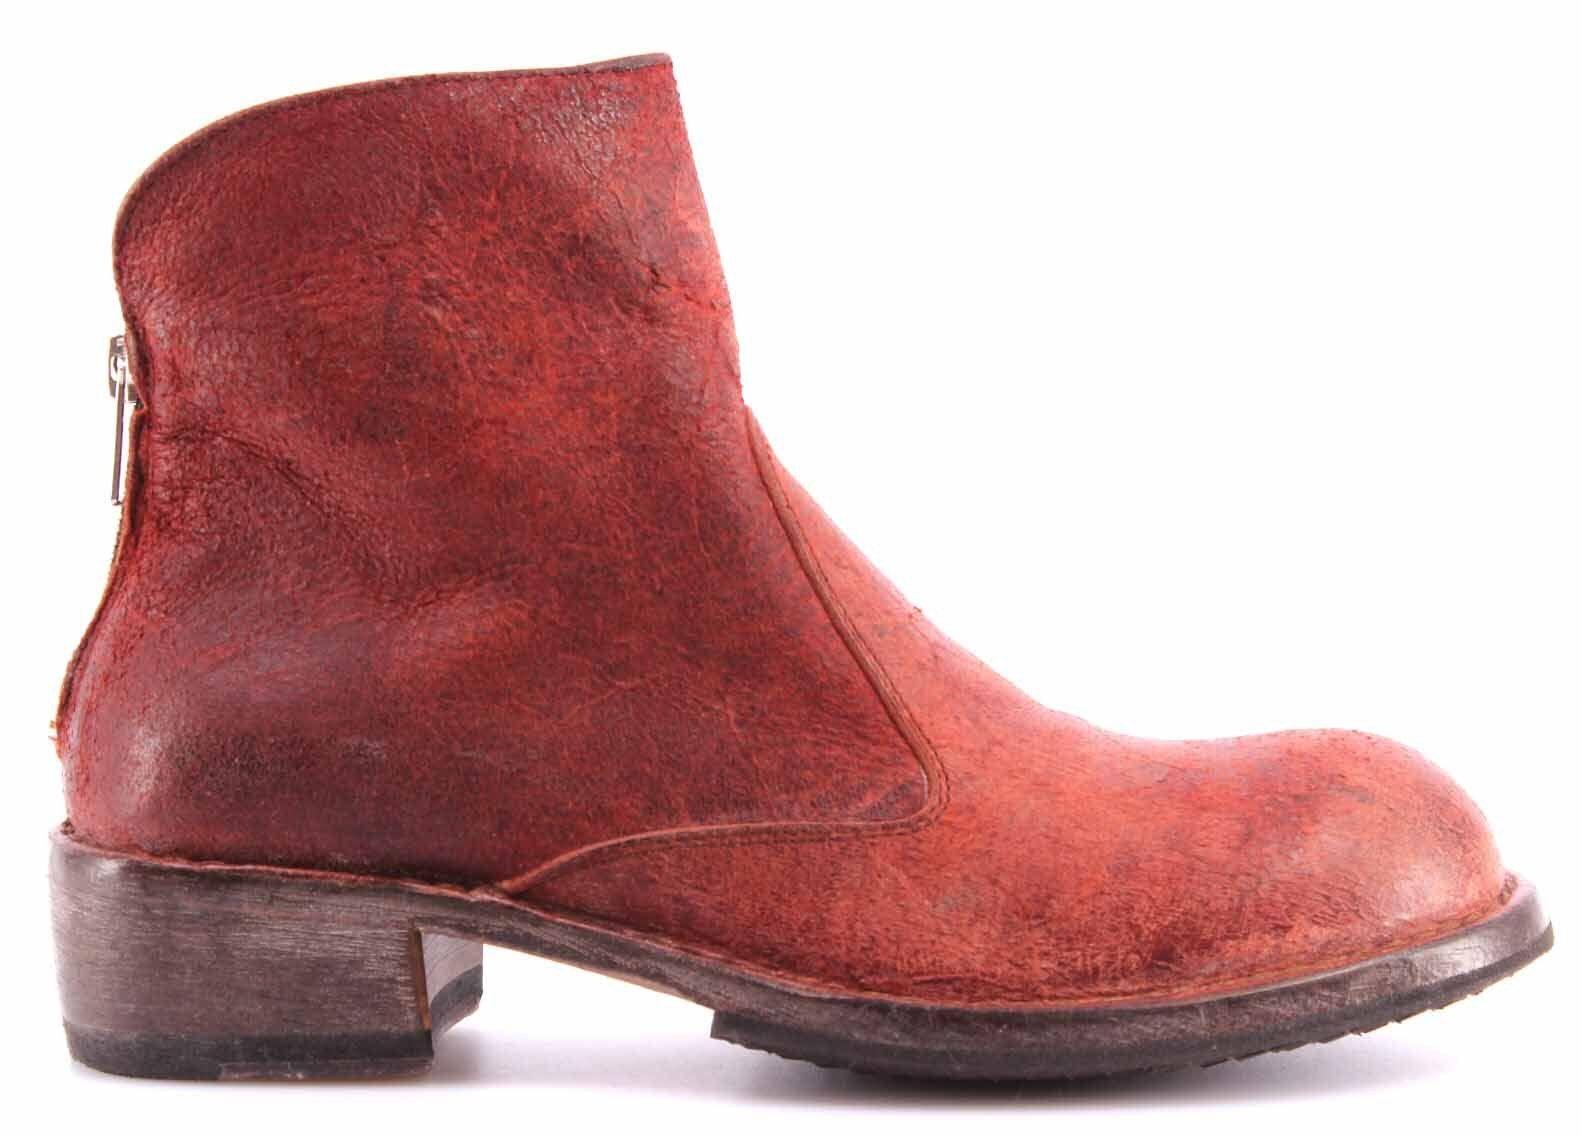 Zapatos Mujer Botines Botines Botines MOMA Ankle Bota Vari D Pelle Crosta Rossa Vintage Italy e42af5